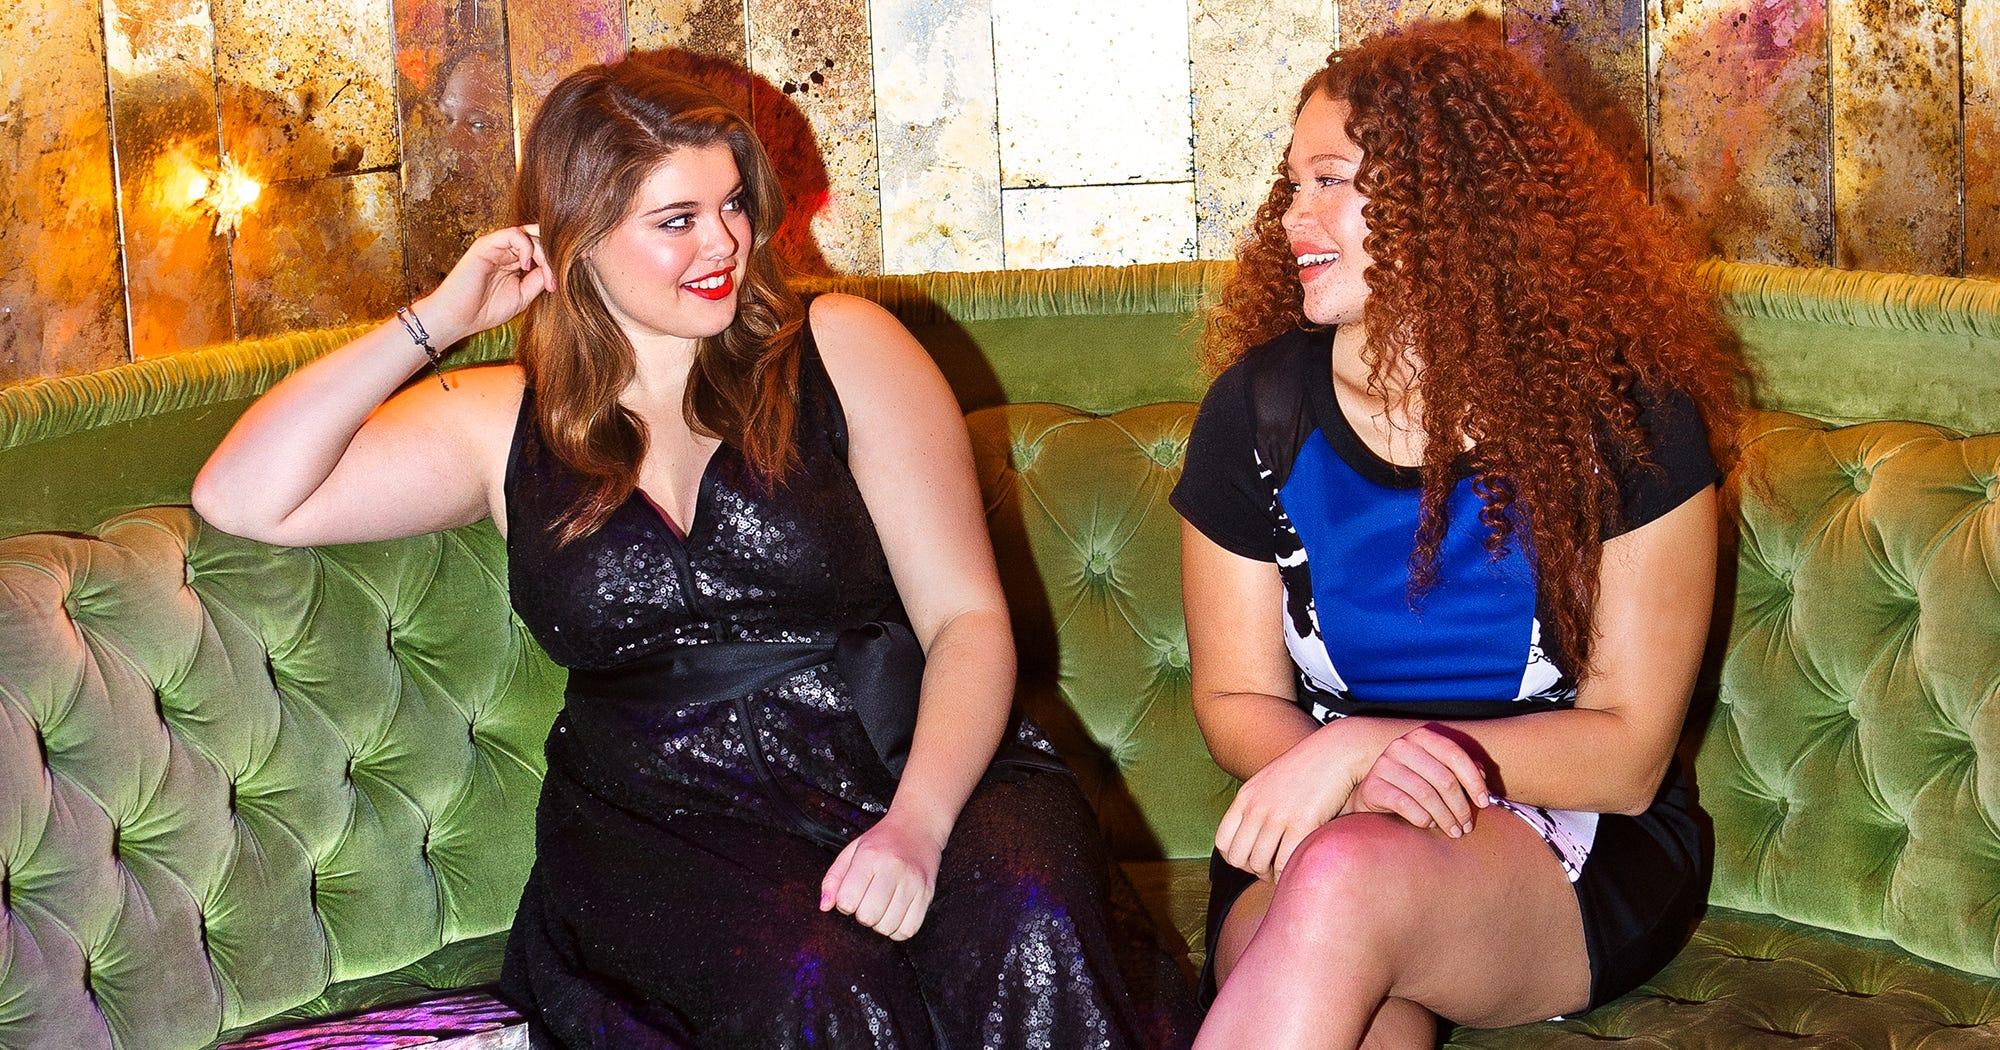 AA dating slang Syracuse dating scene